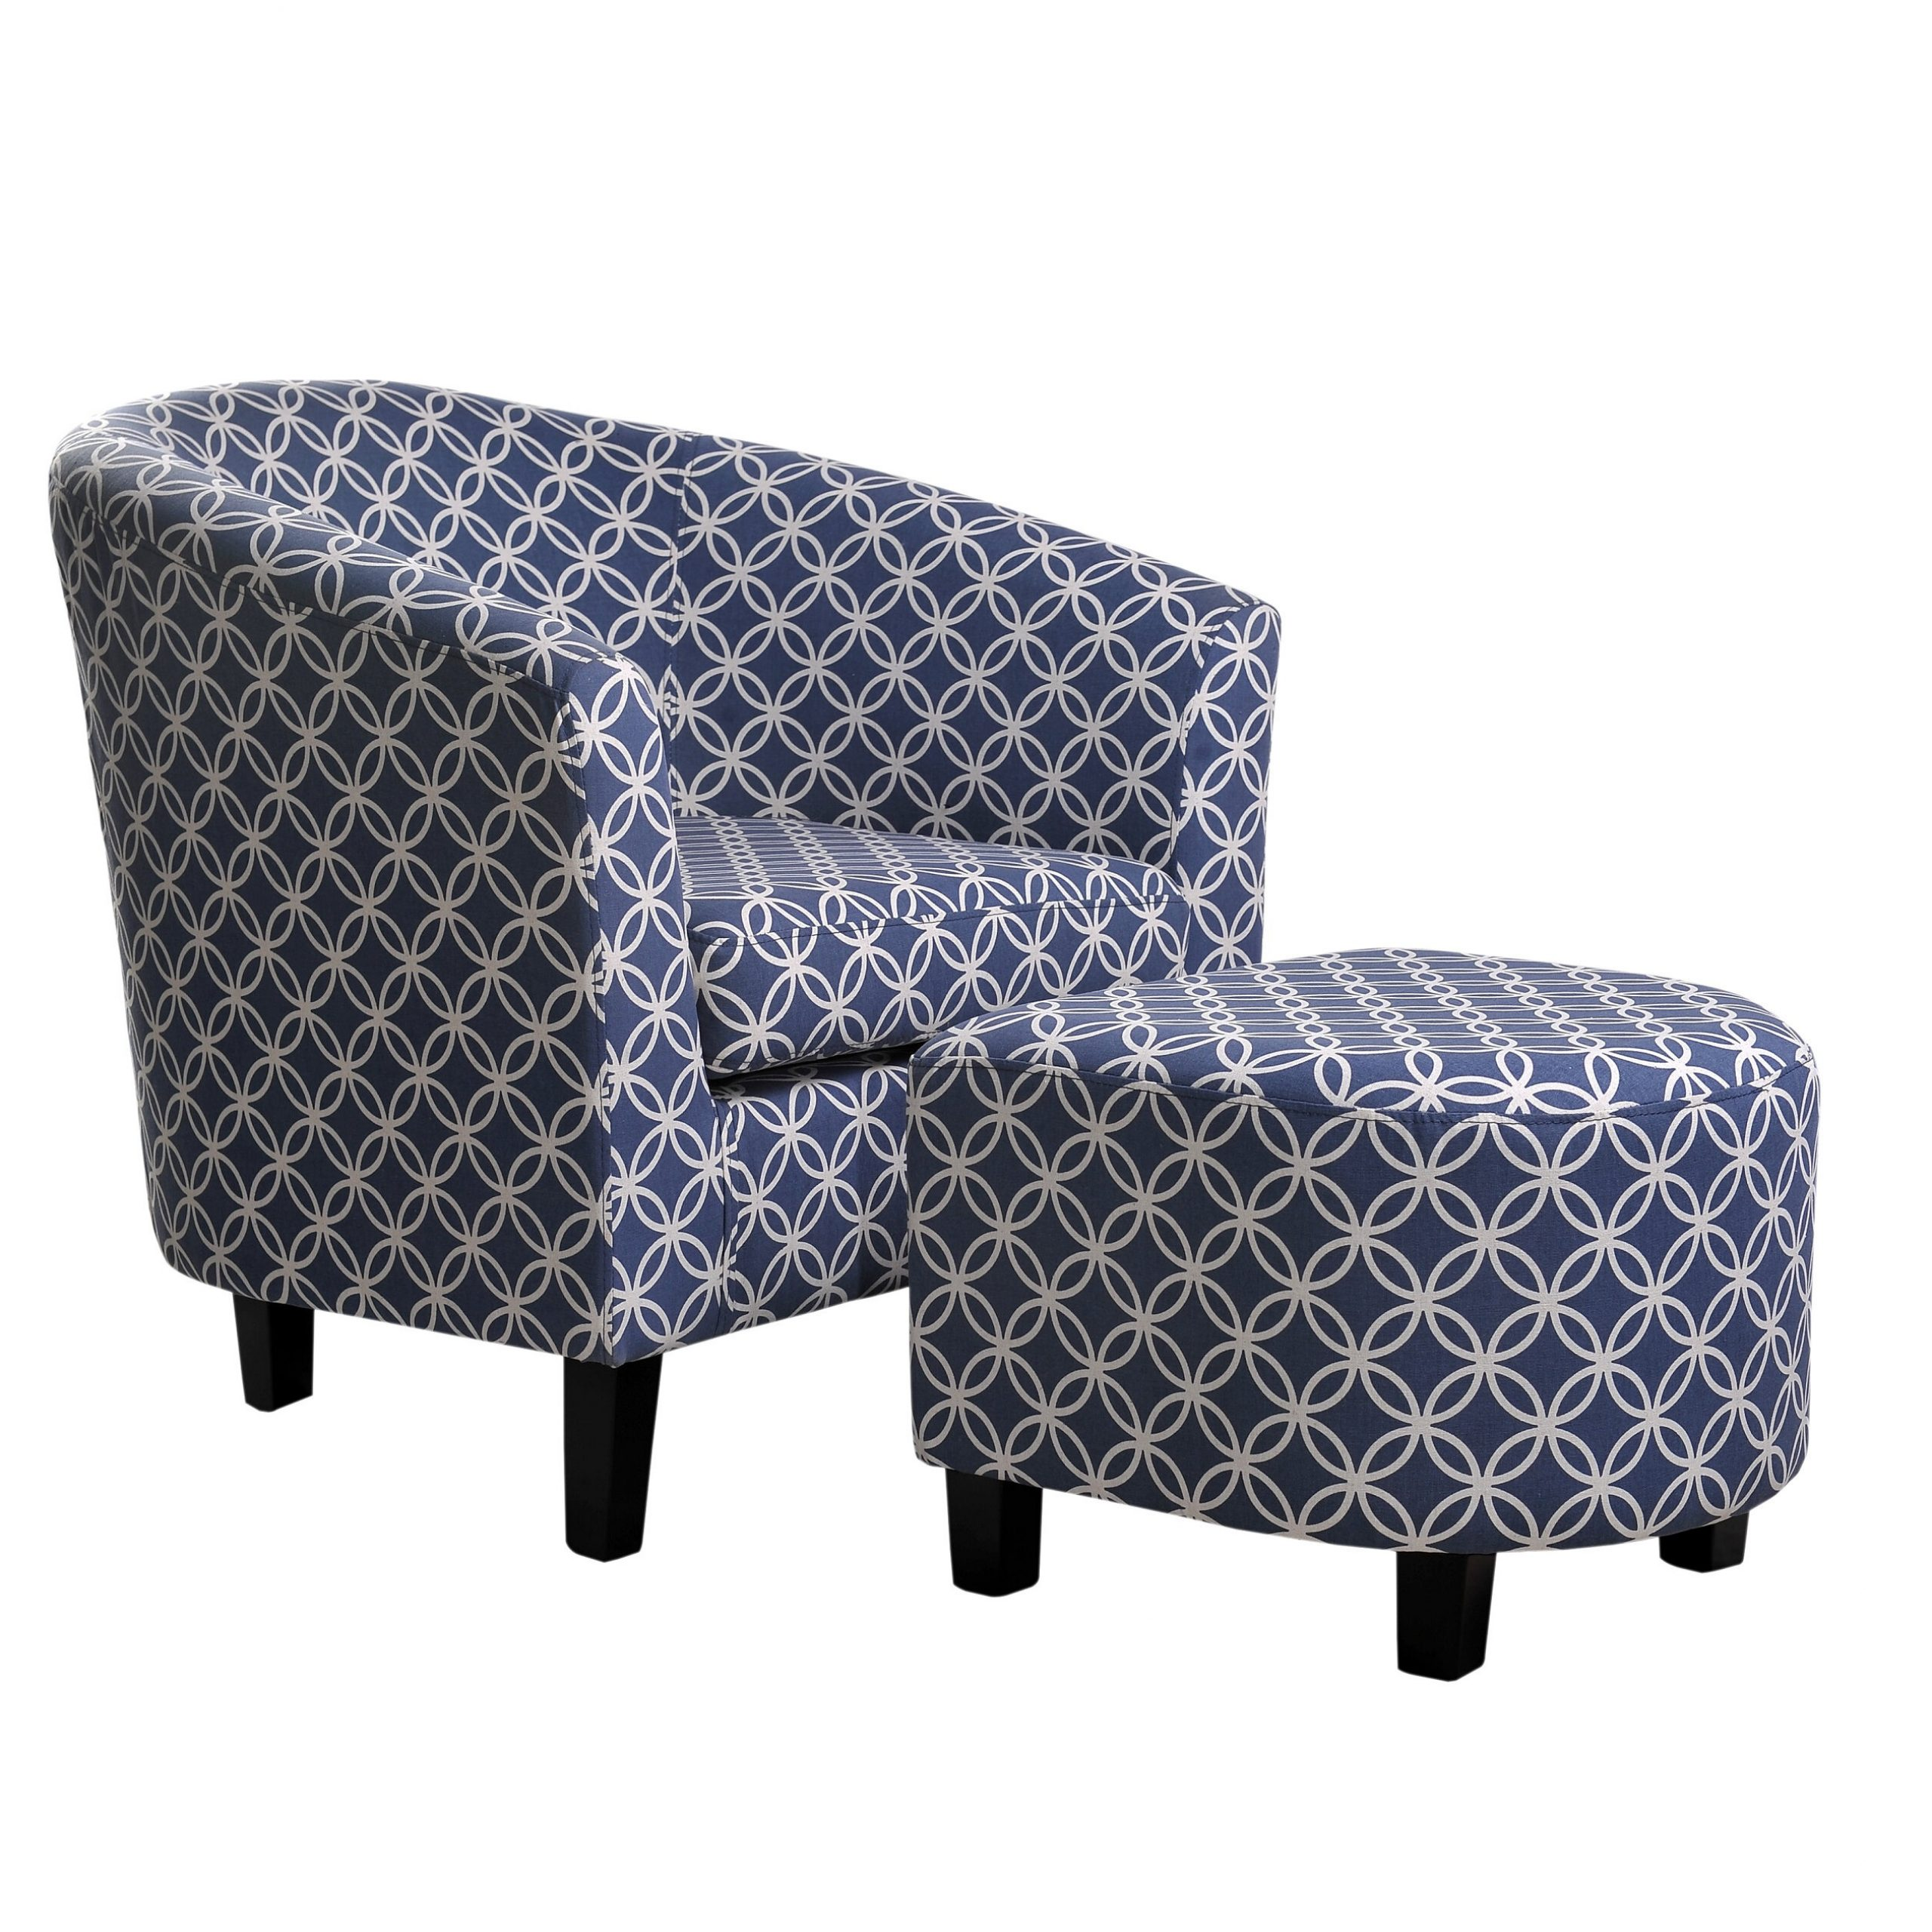 "Mcfadden 21"" Barrel Chair And Ottoman With Artemi Barrel Chair And Ottoman Sets (View 3 of 15)"